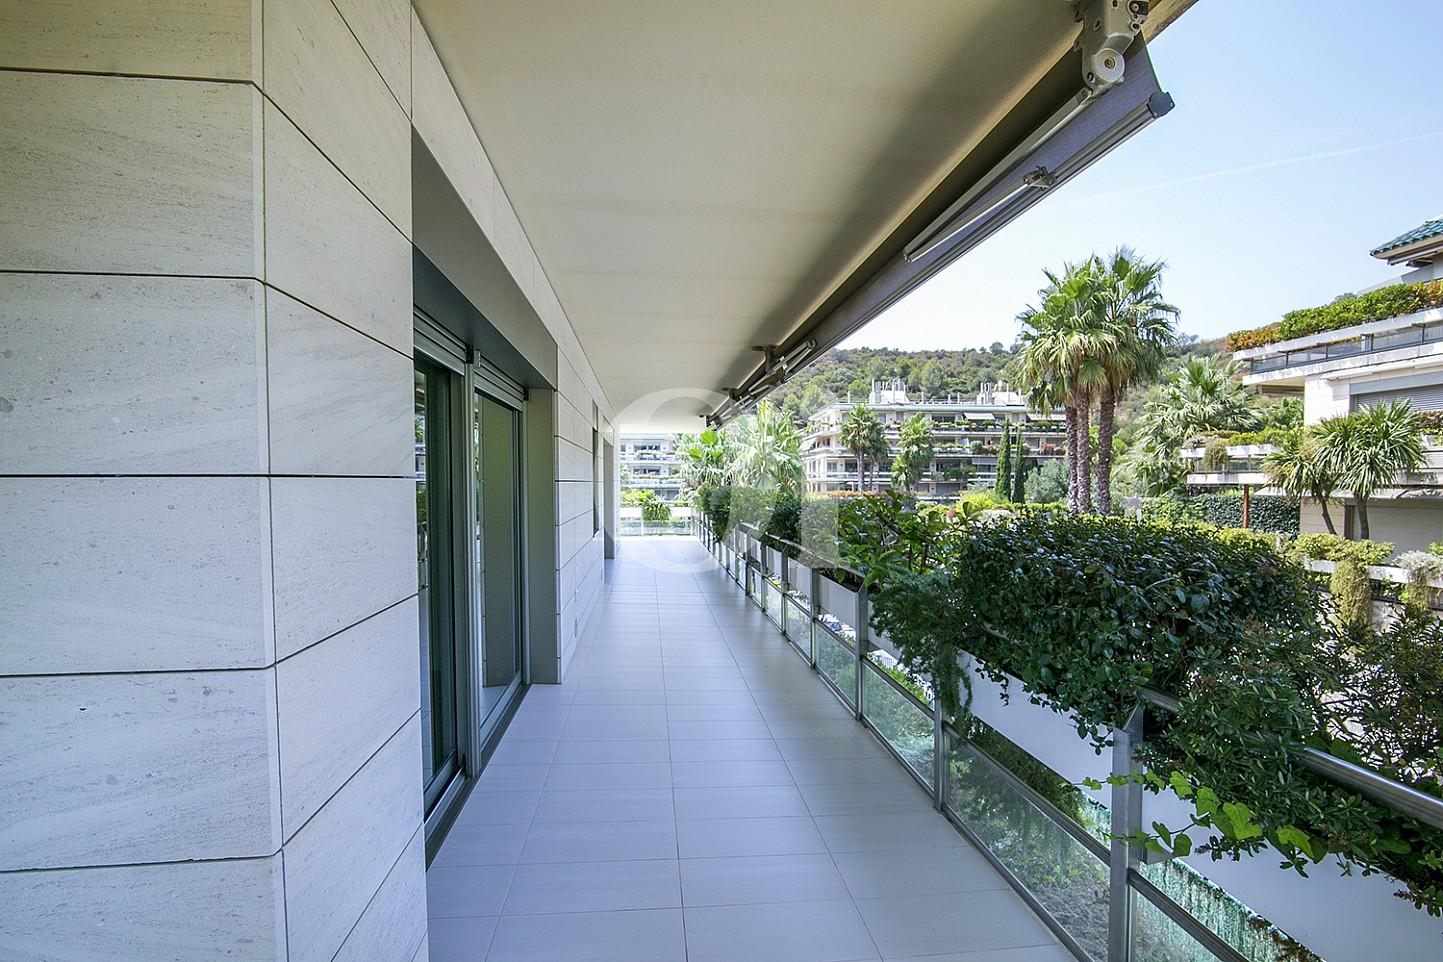 Appartement en vente dans un complexe r sidentiel de barcelone torre vilana - Appartement vente barcelone ...